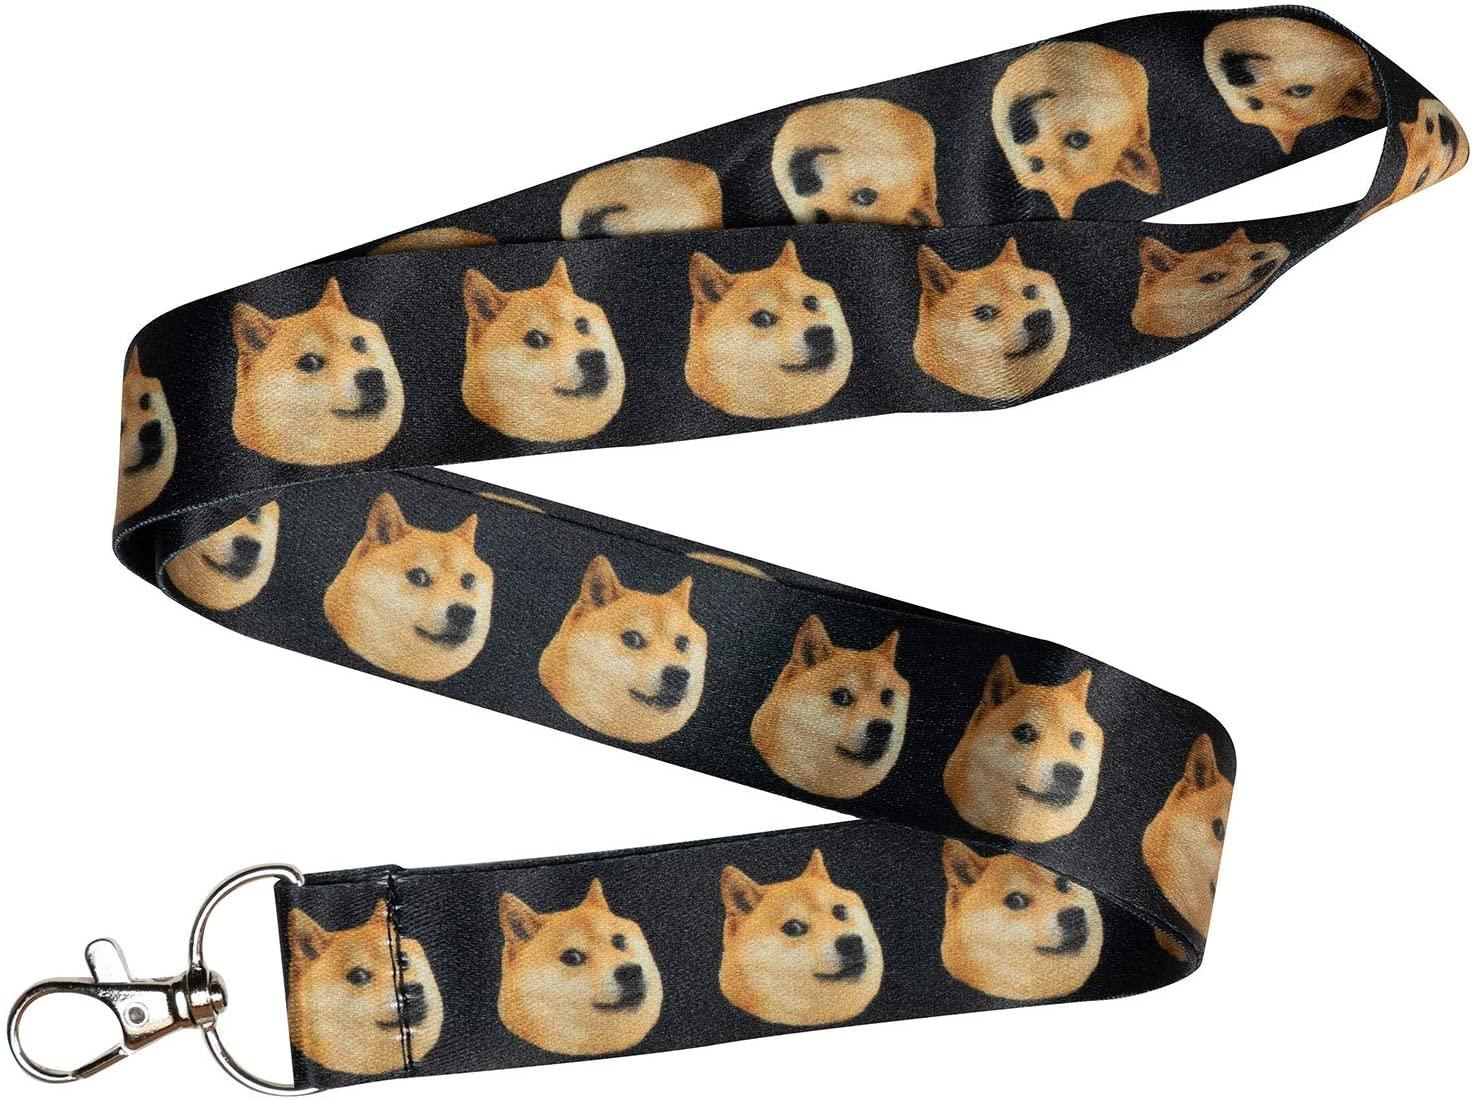 Doge Meme Black Keychain Holder Lanyard